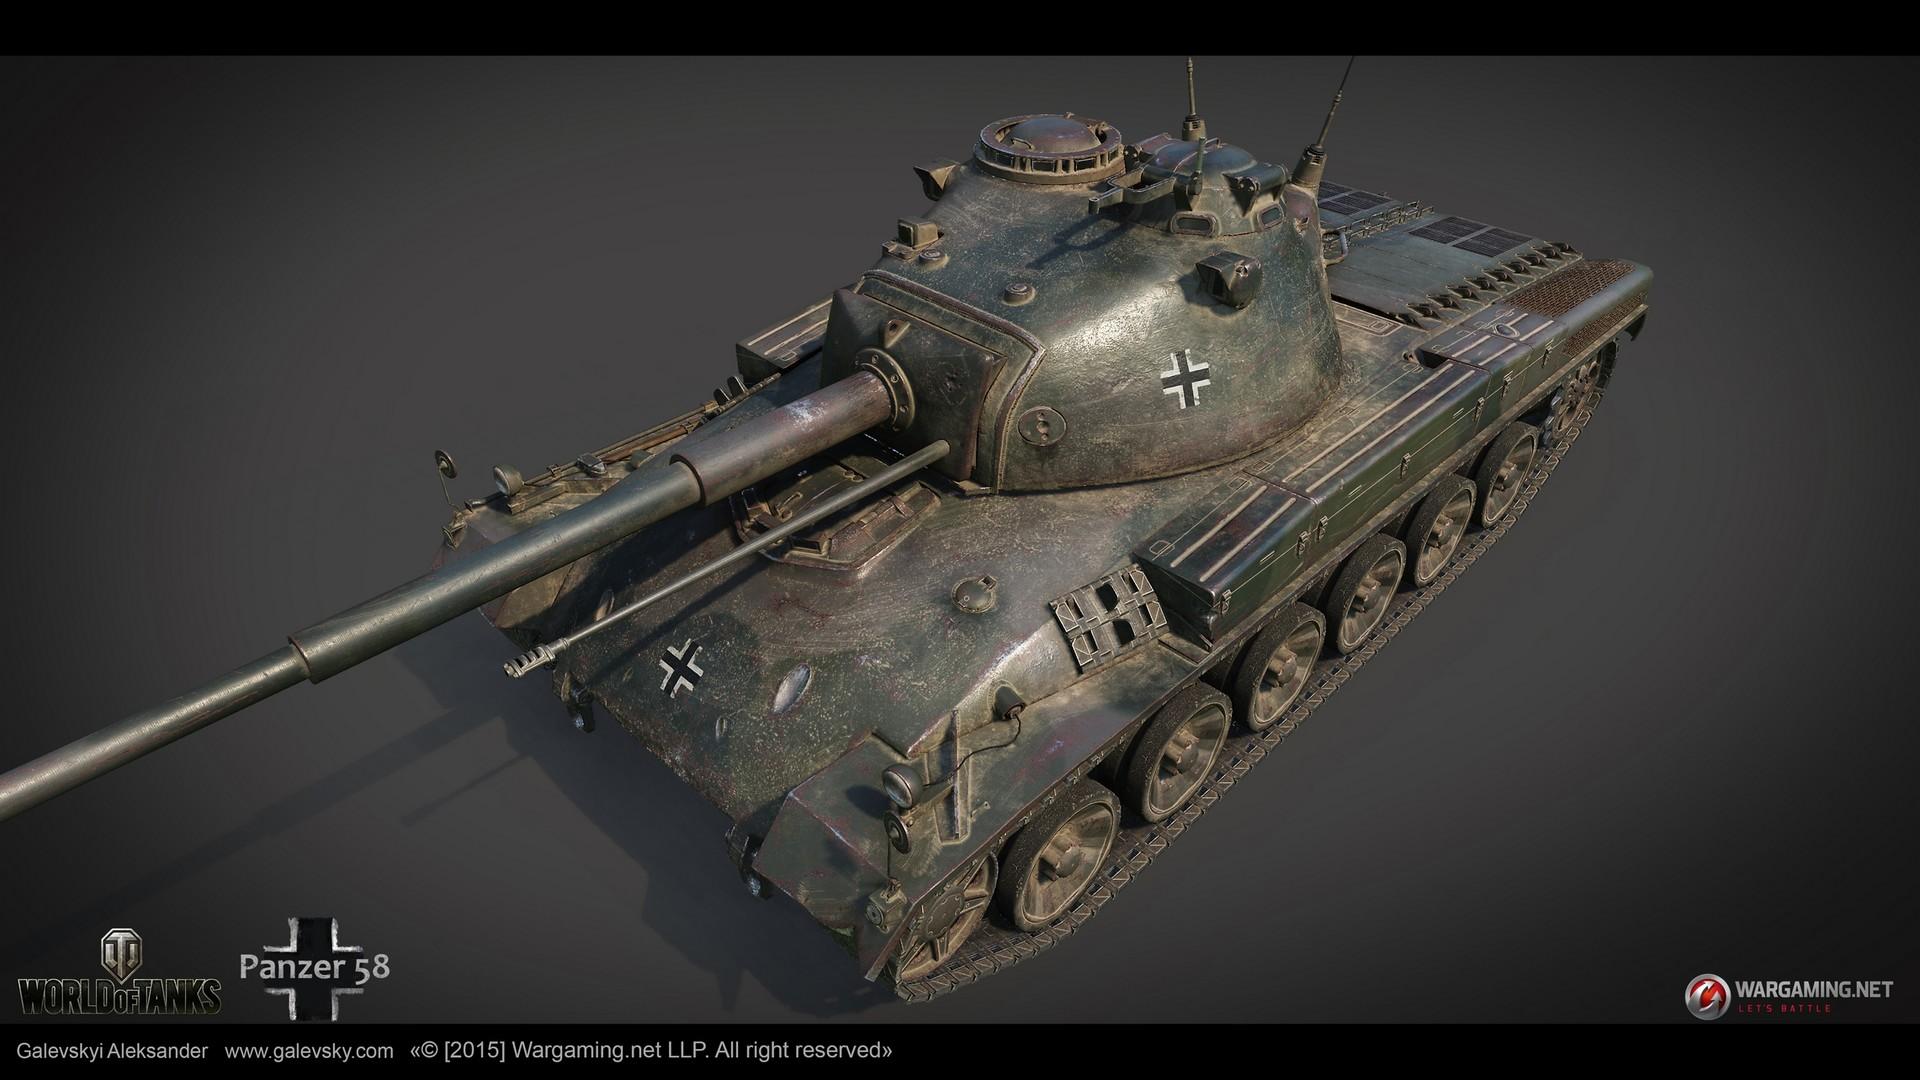 Aleksander galevskyi panzer 58 02 med